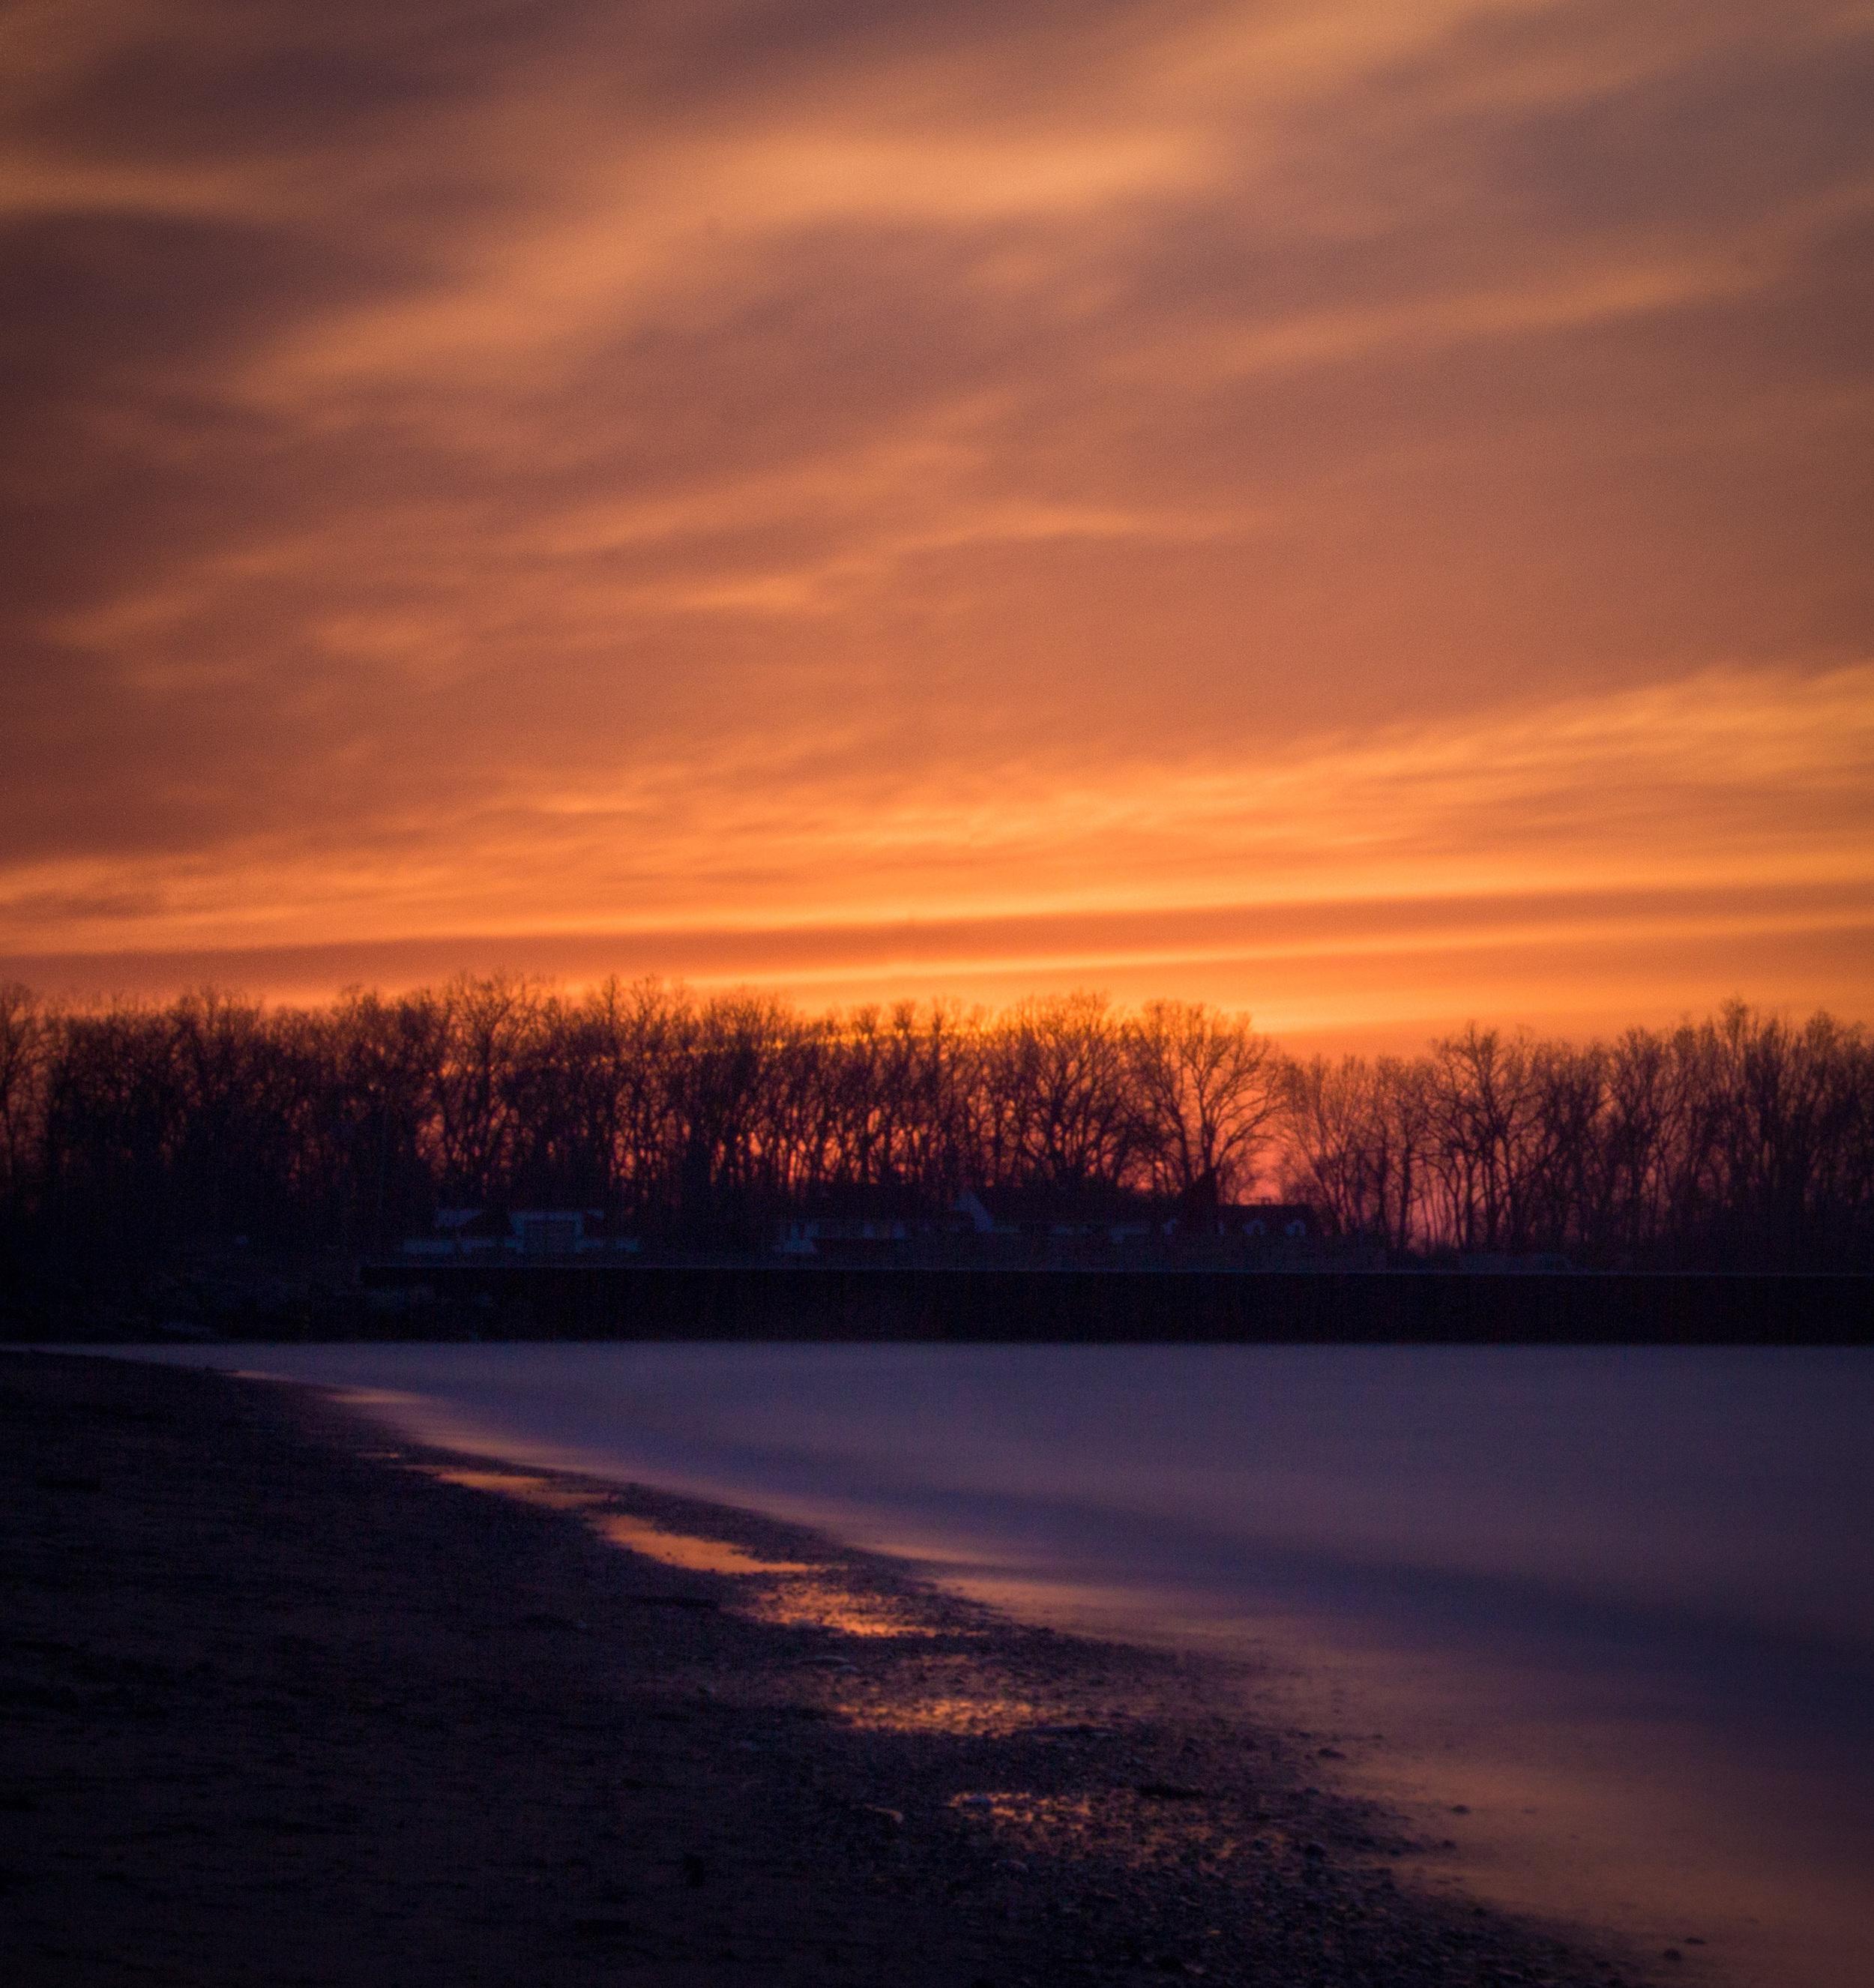 sunset041413-1.jpg